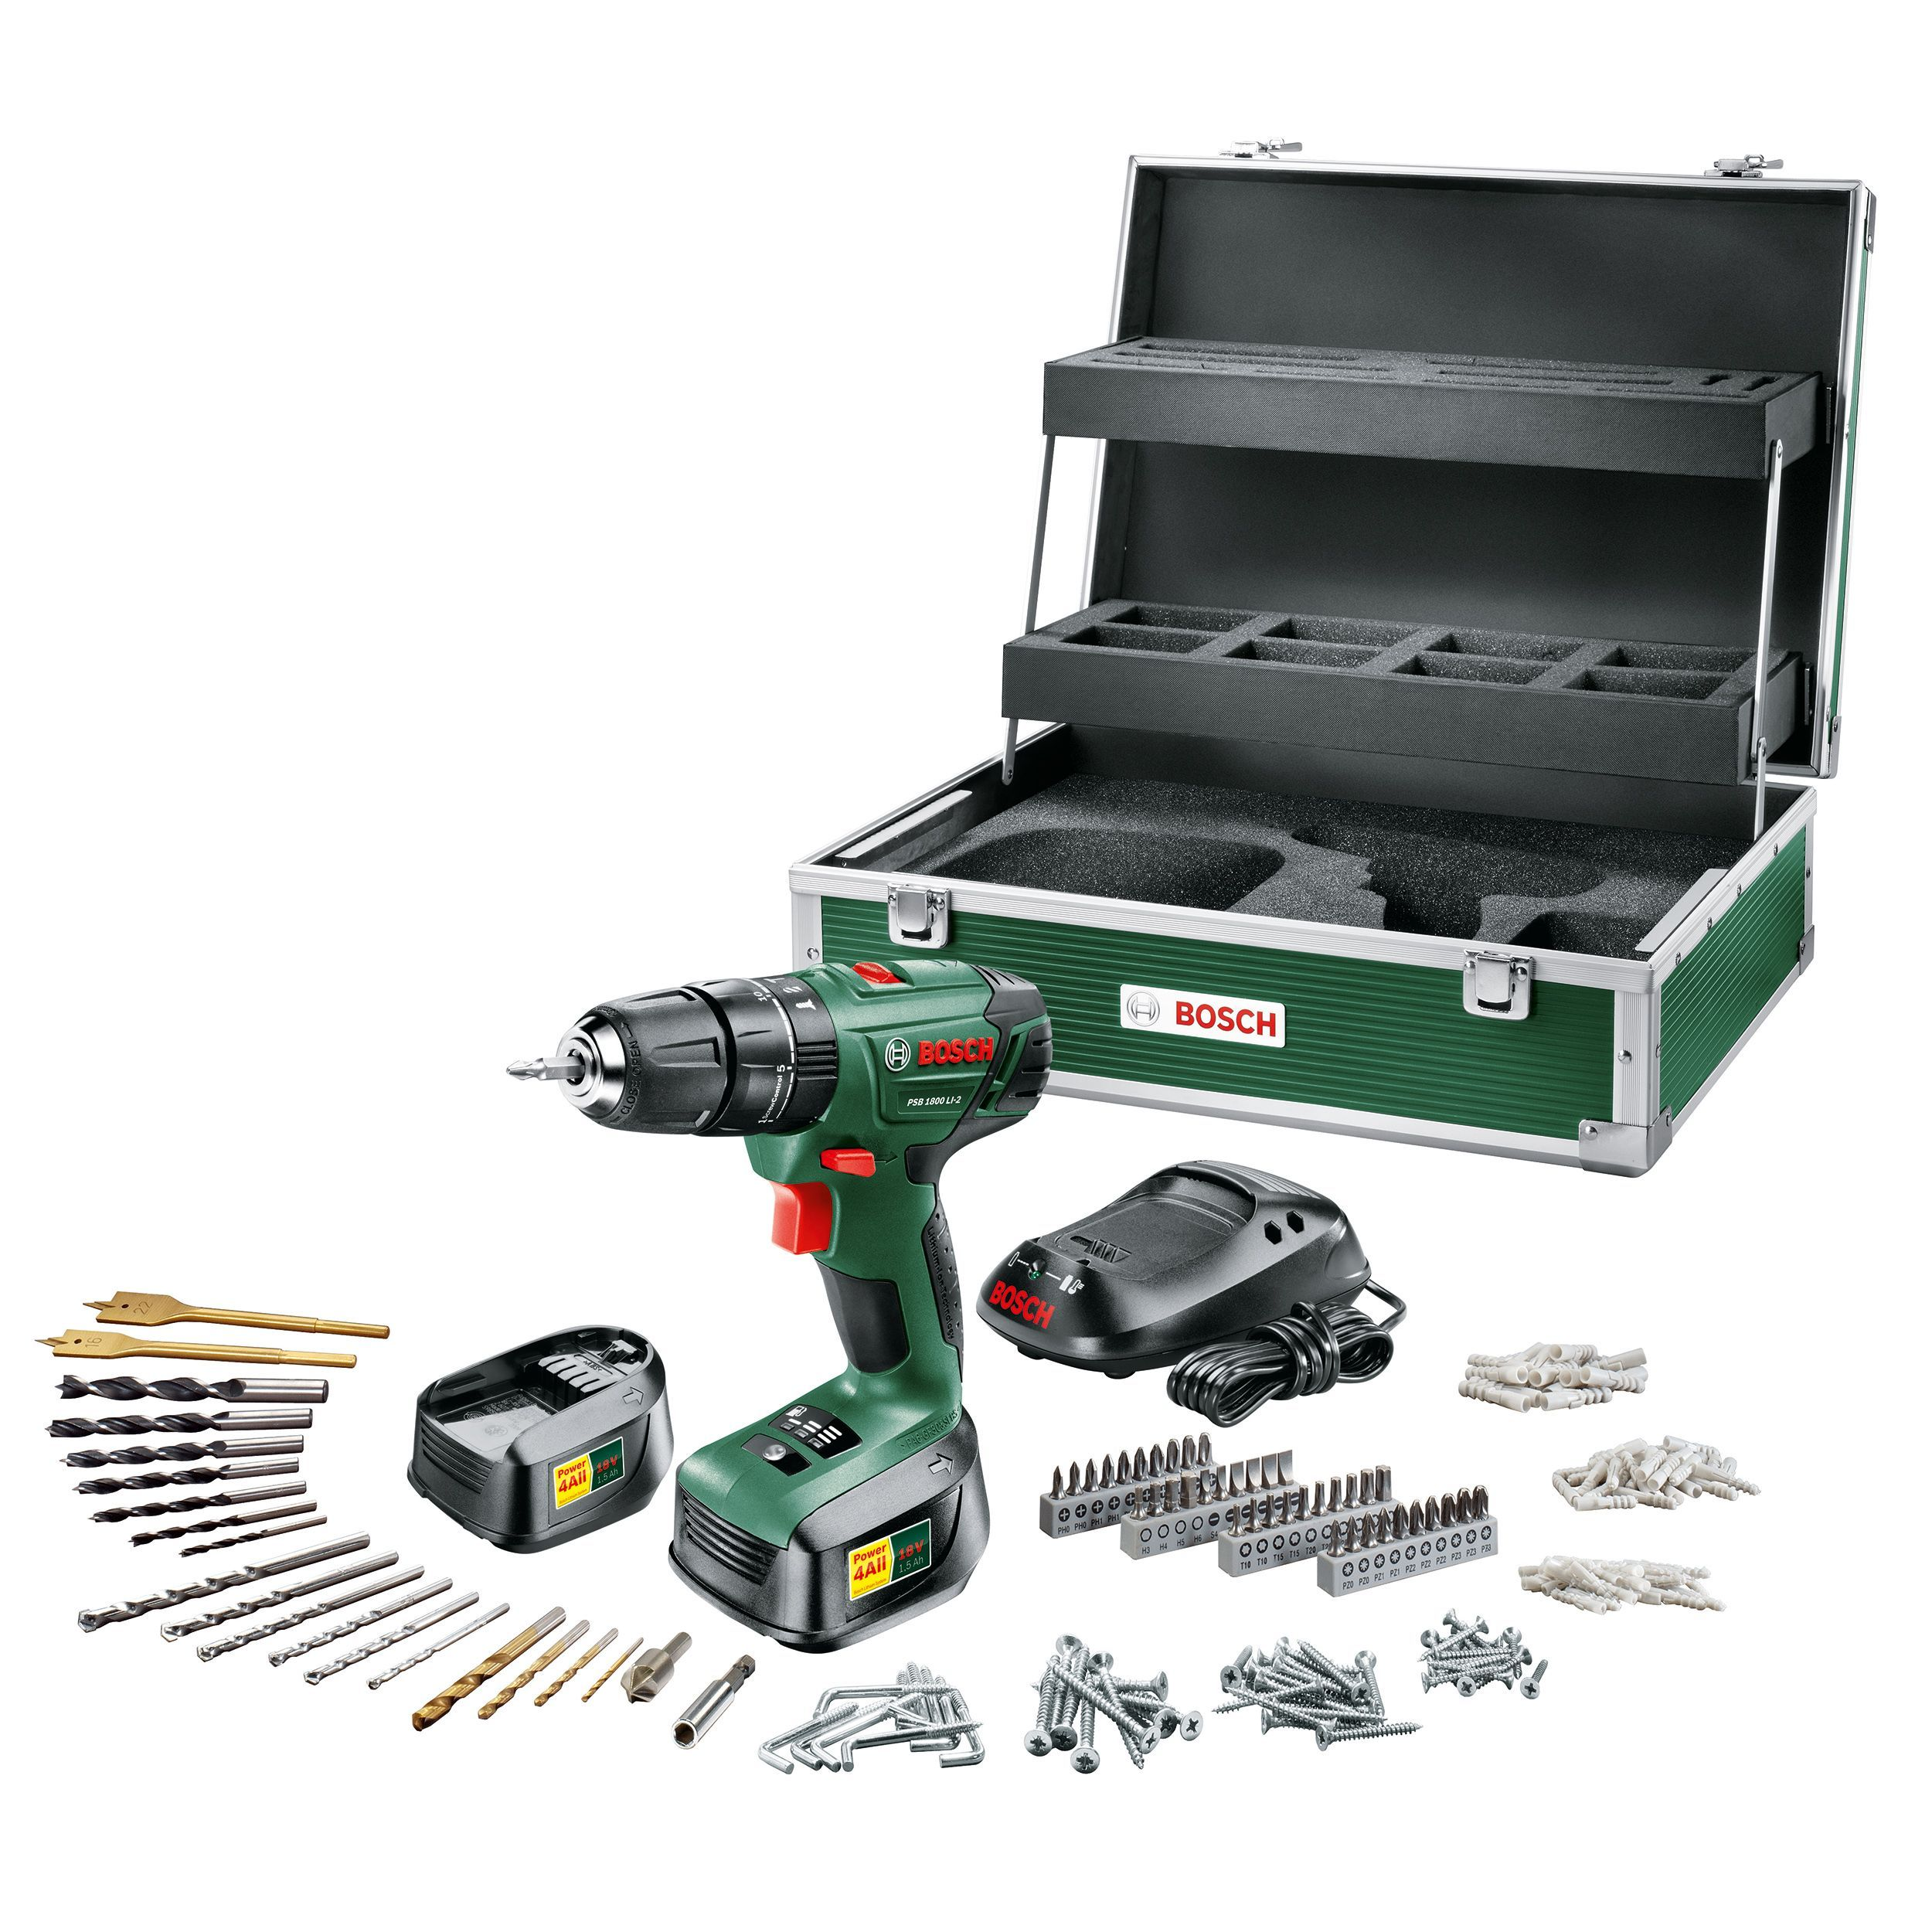 bosch cordless 18v li-ion hammer drill 2 batteries with toolbox psb